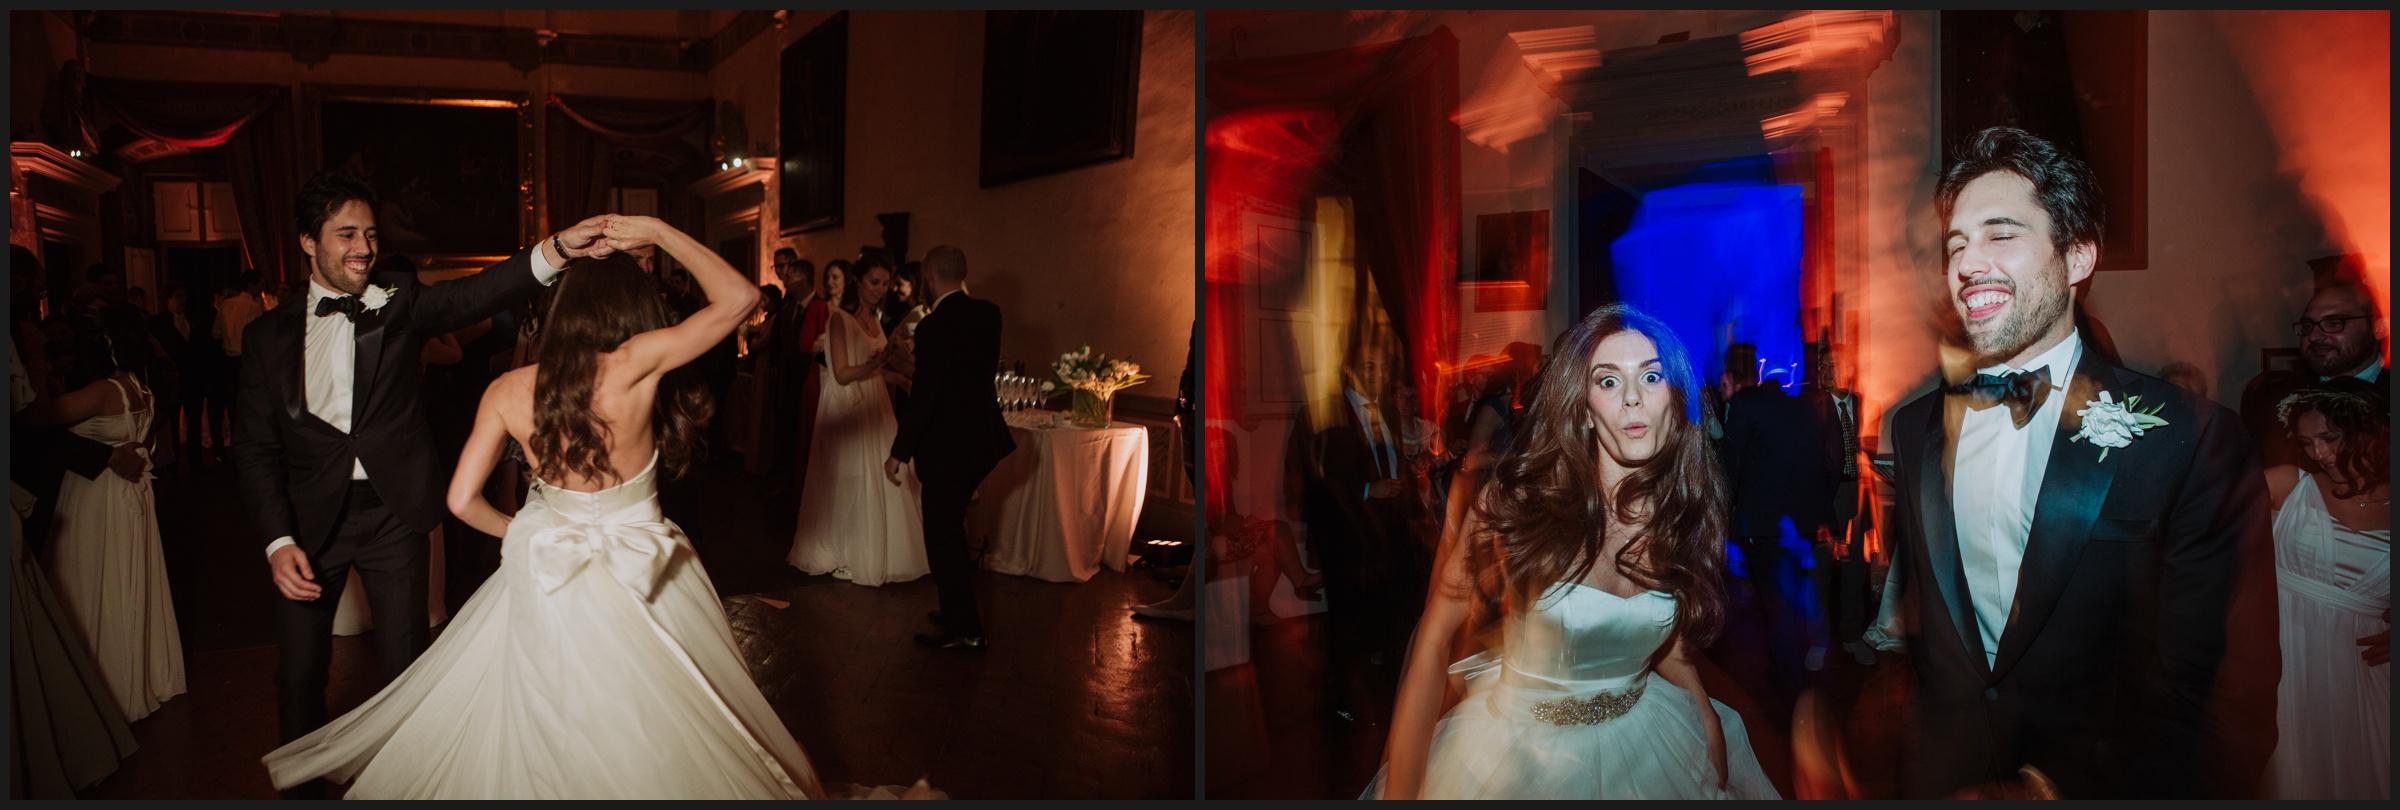 wedding party in Villa Corsini